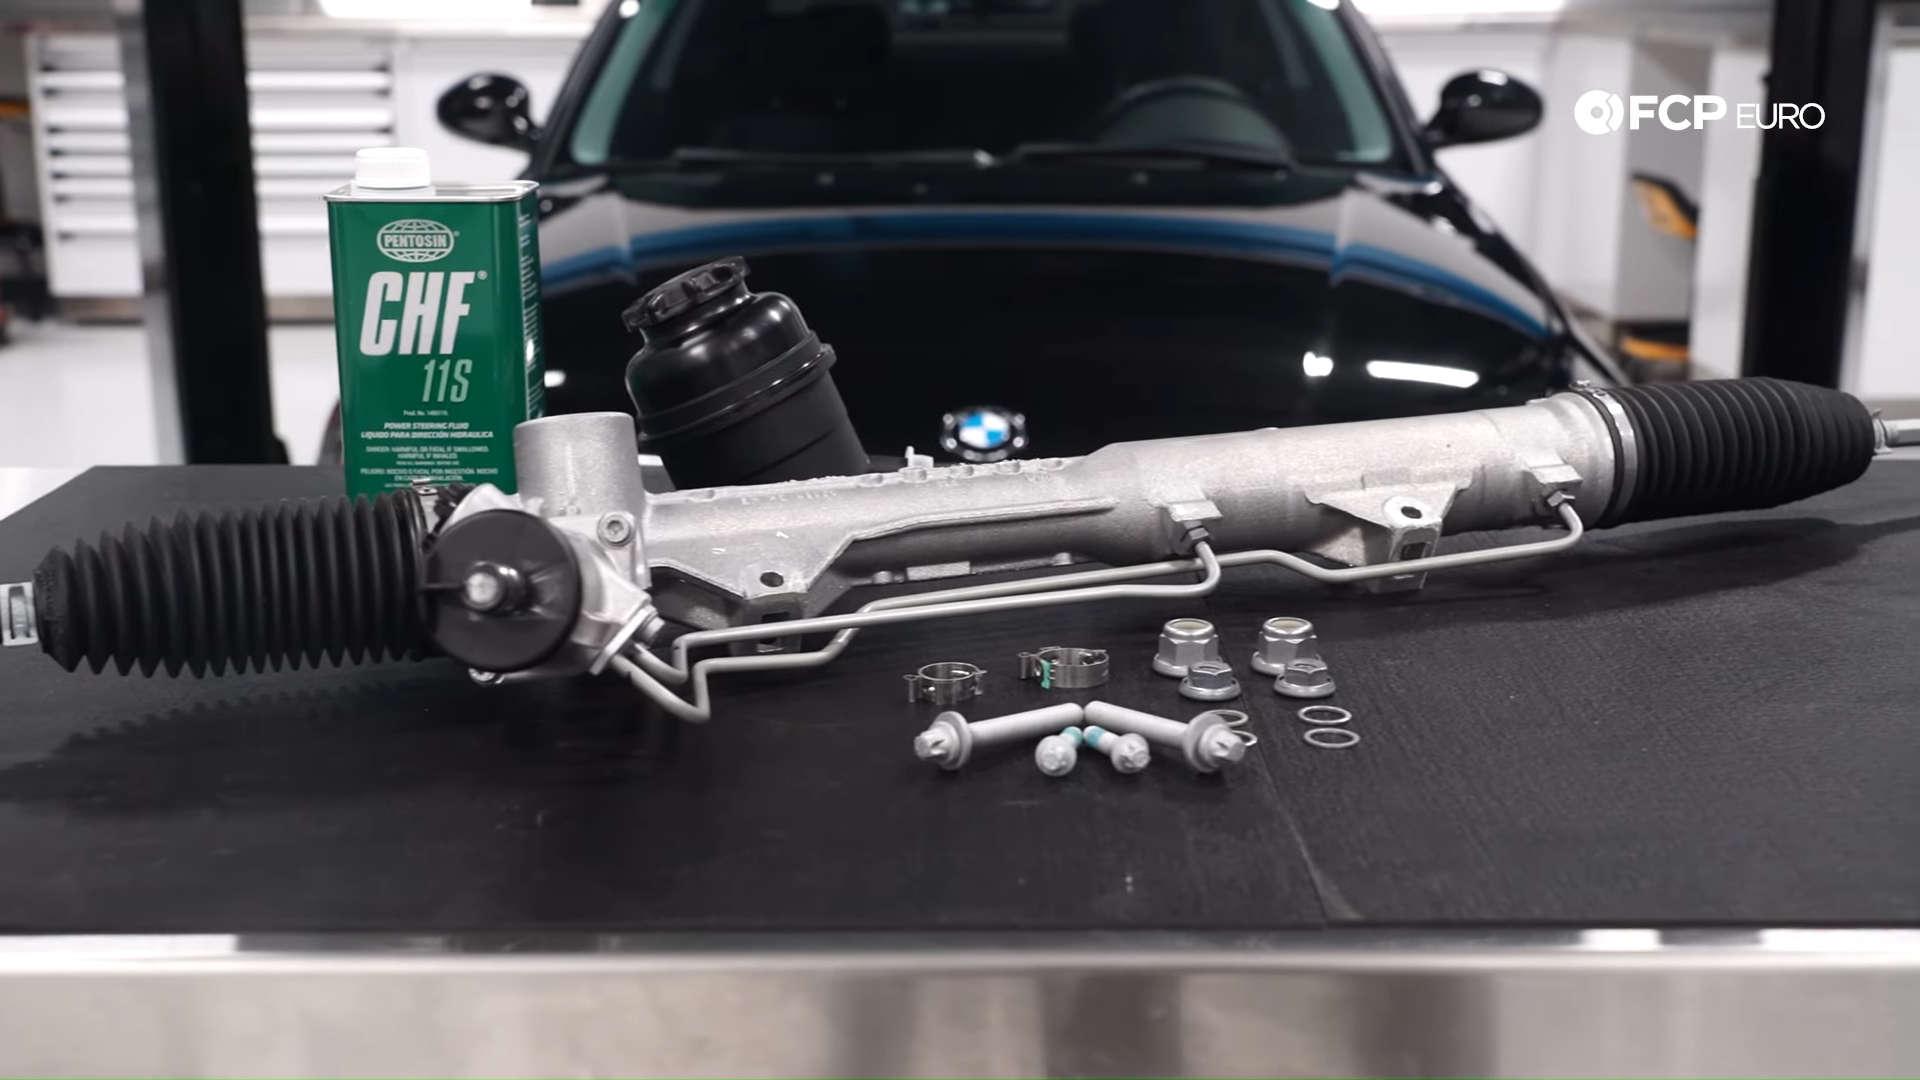 BMW E82, E90, E92 Steering Rack Kit (328i, 335i, 135i, & More) - Failure Symptoms And Product Review